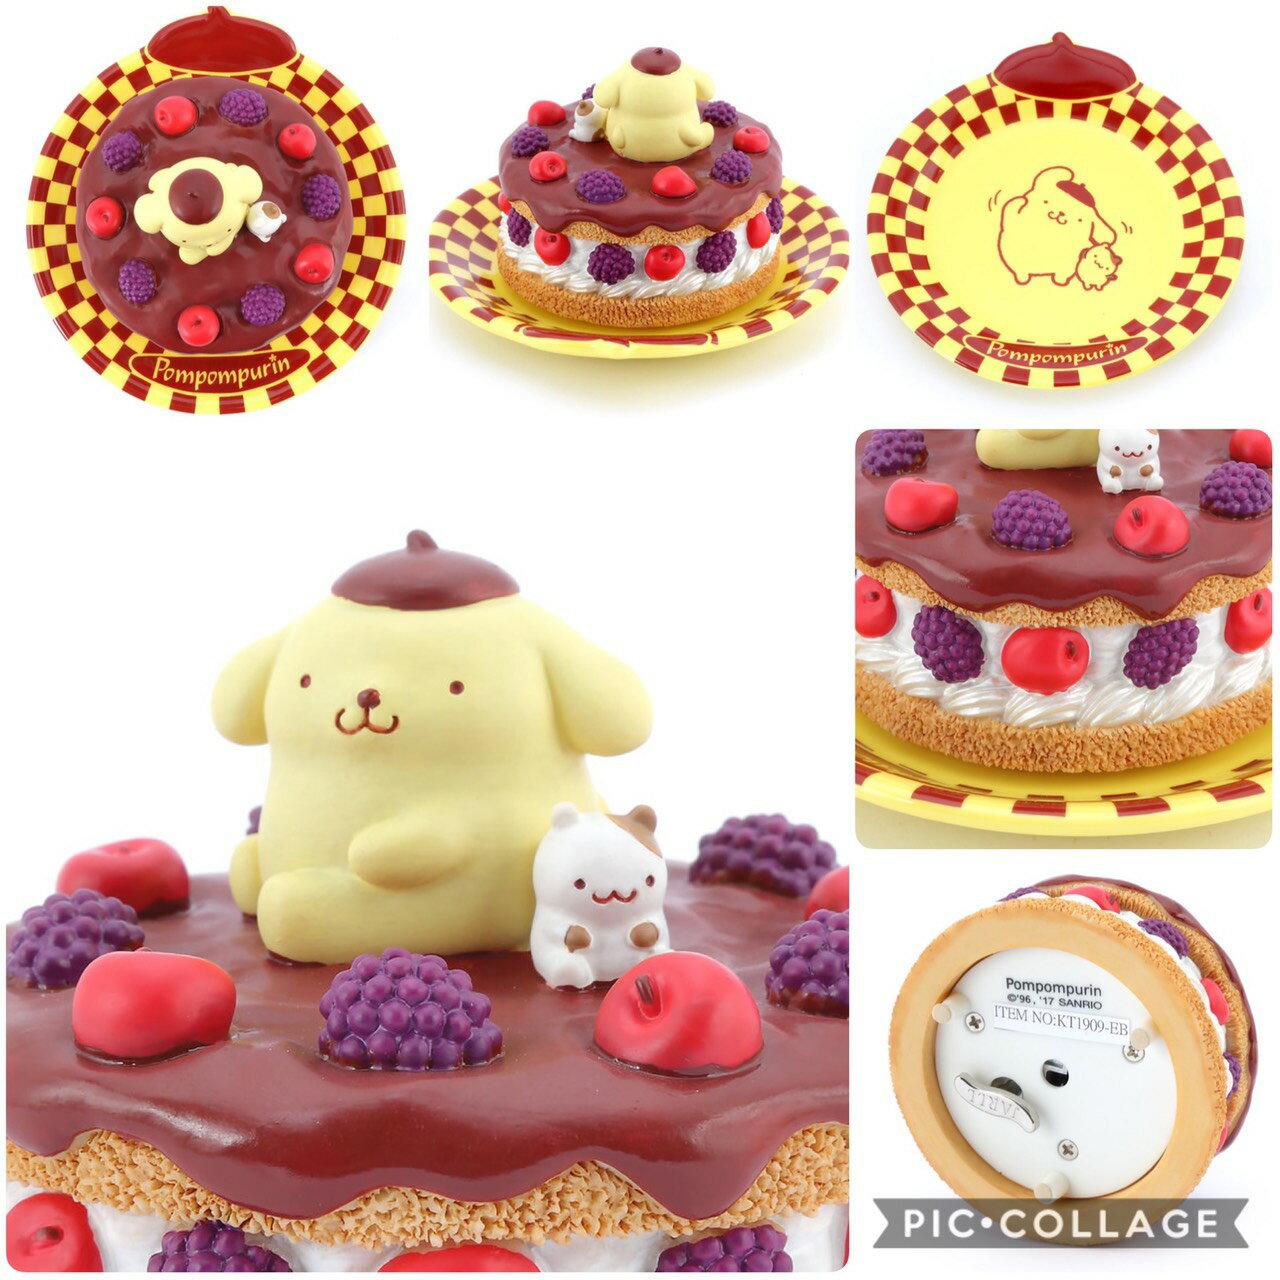 Pom Pom Purin 布丁狗 夢幻甜點系列之  甜點/ 生日蛋糕 水晶球音樂盒/擺飾